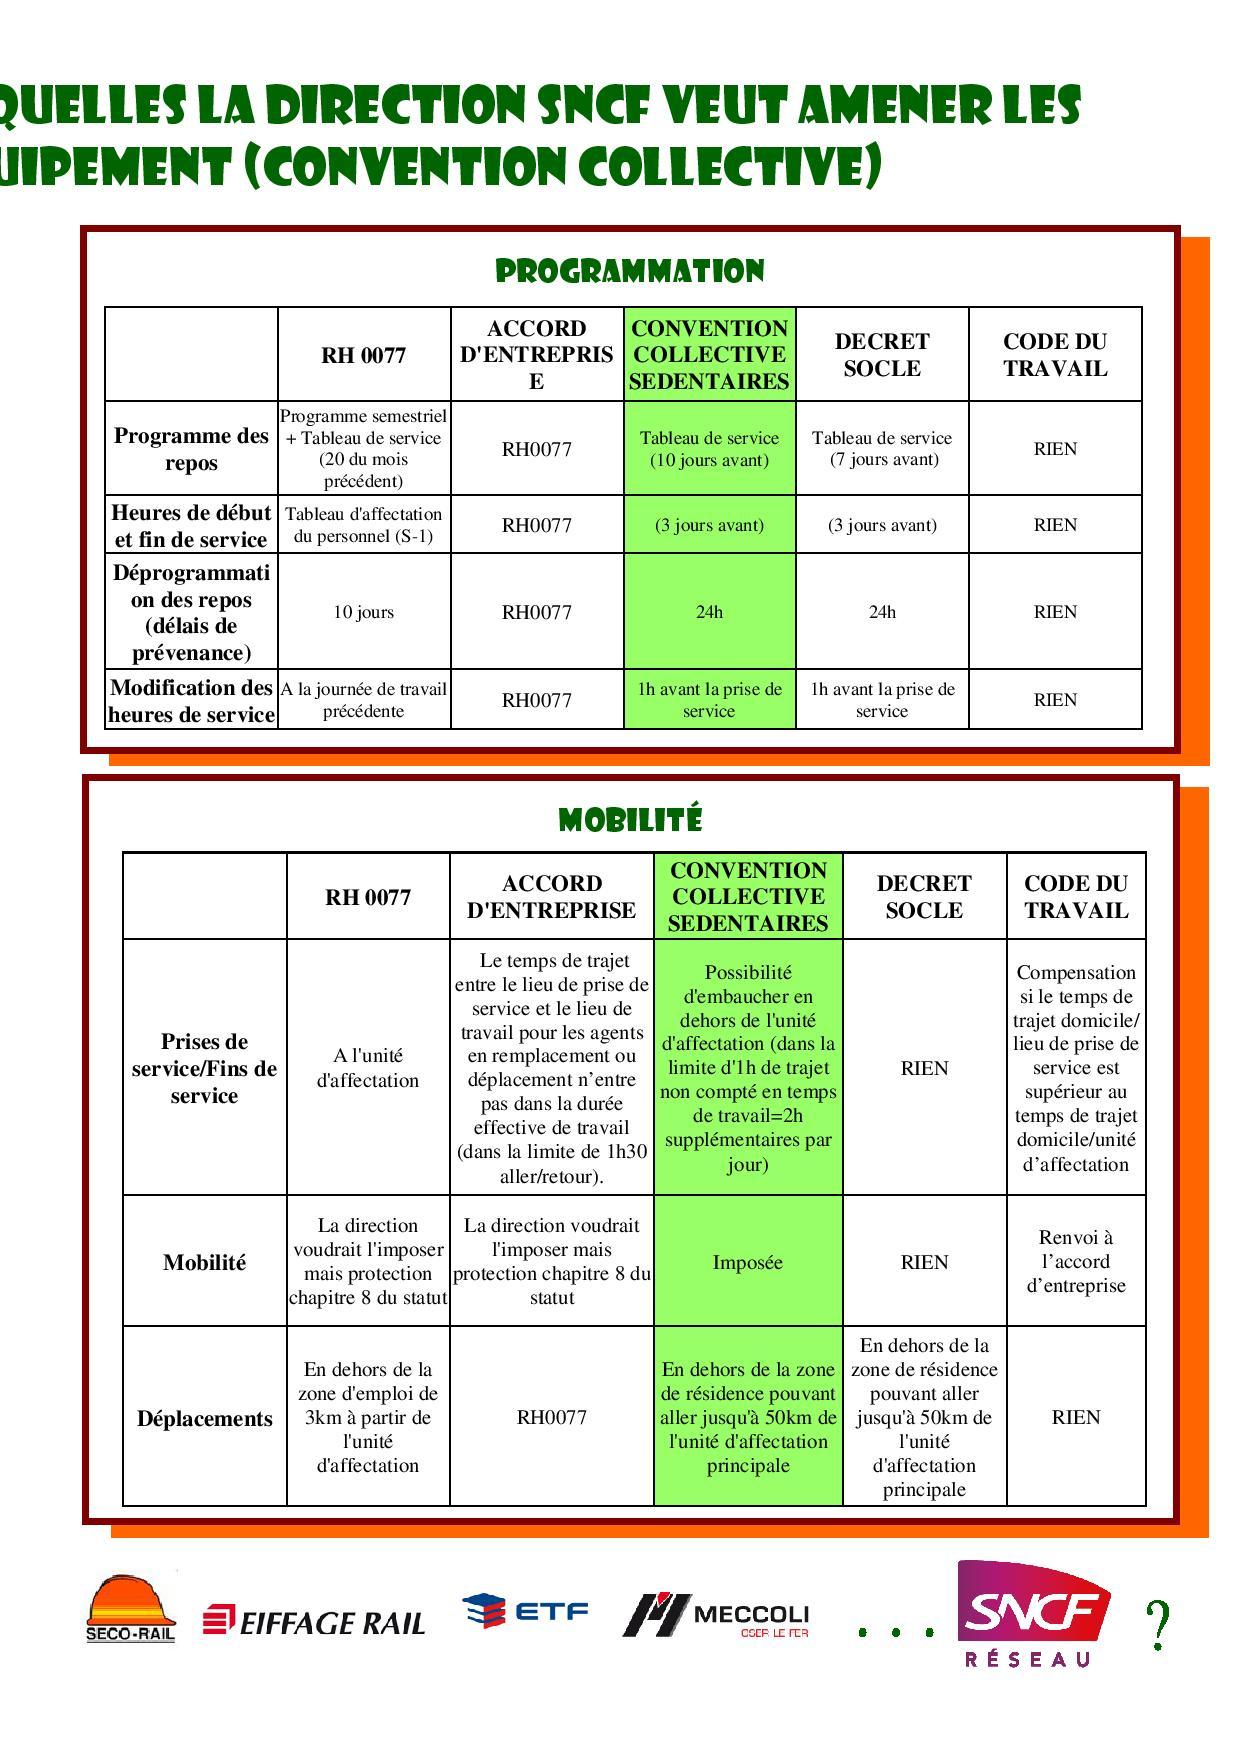 Equipement - negocier recul sociaux 06-2016-page-003